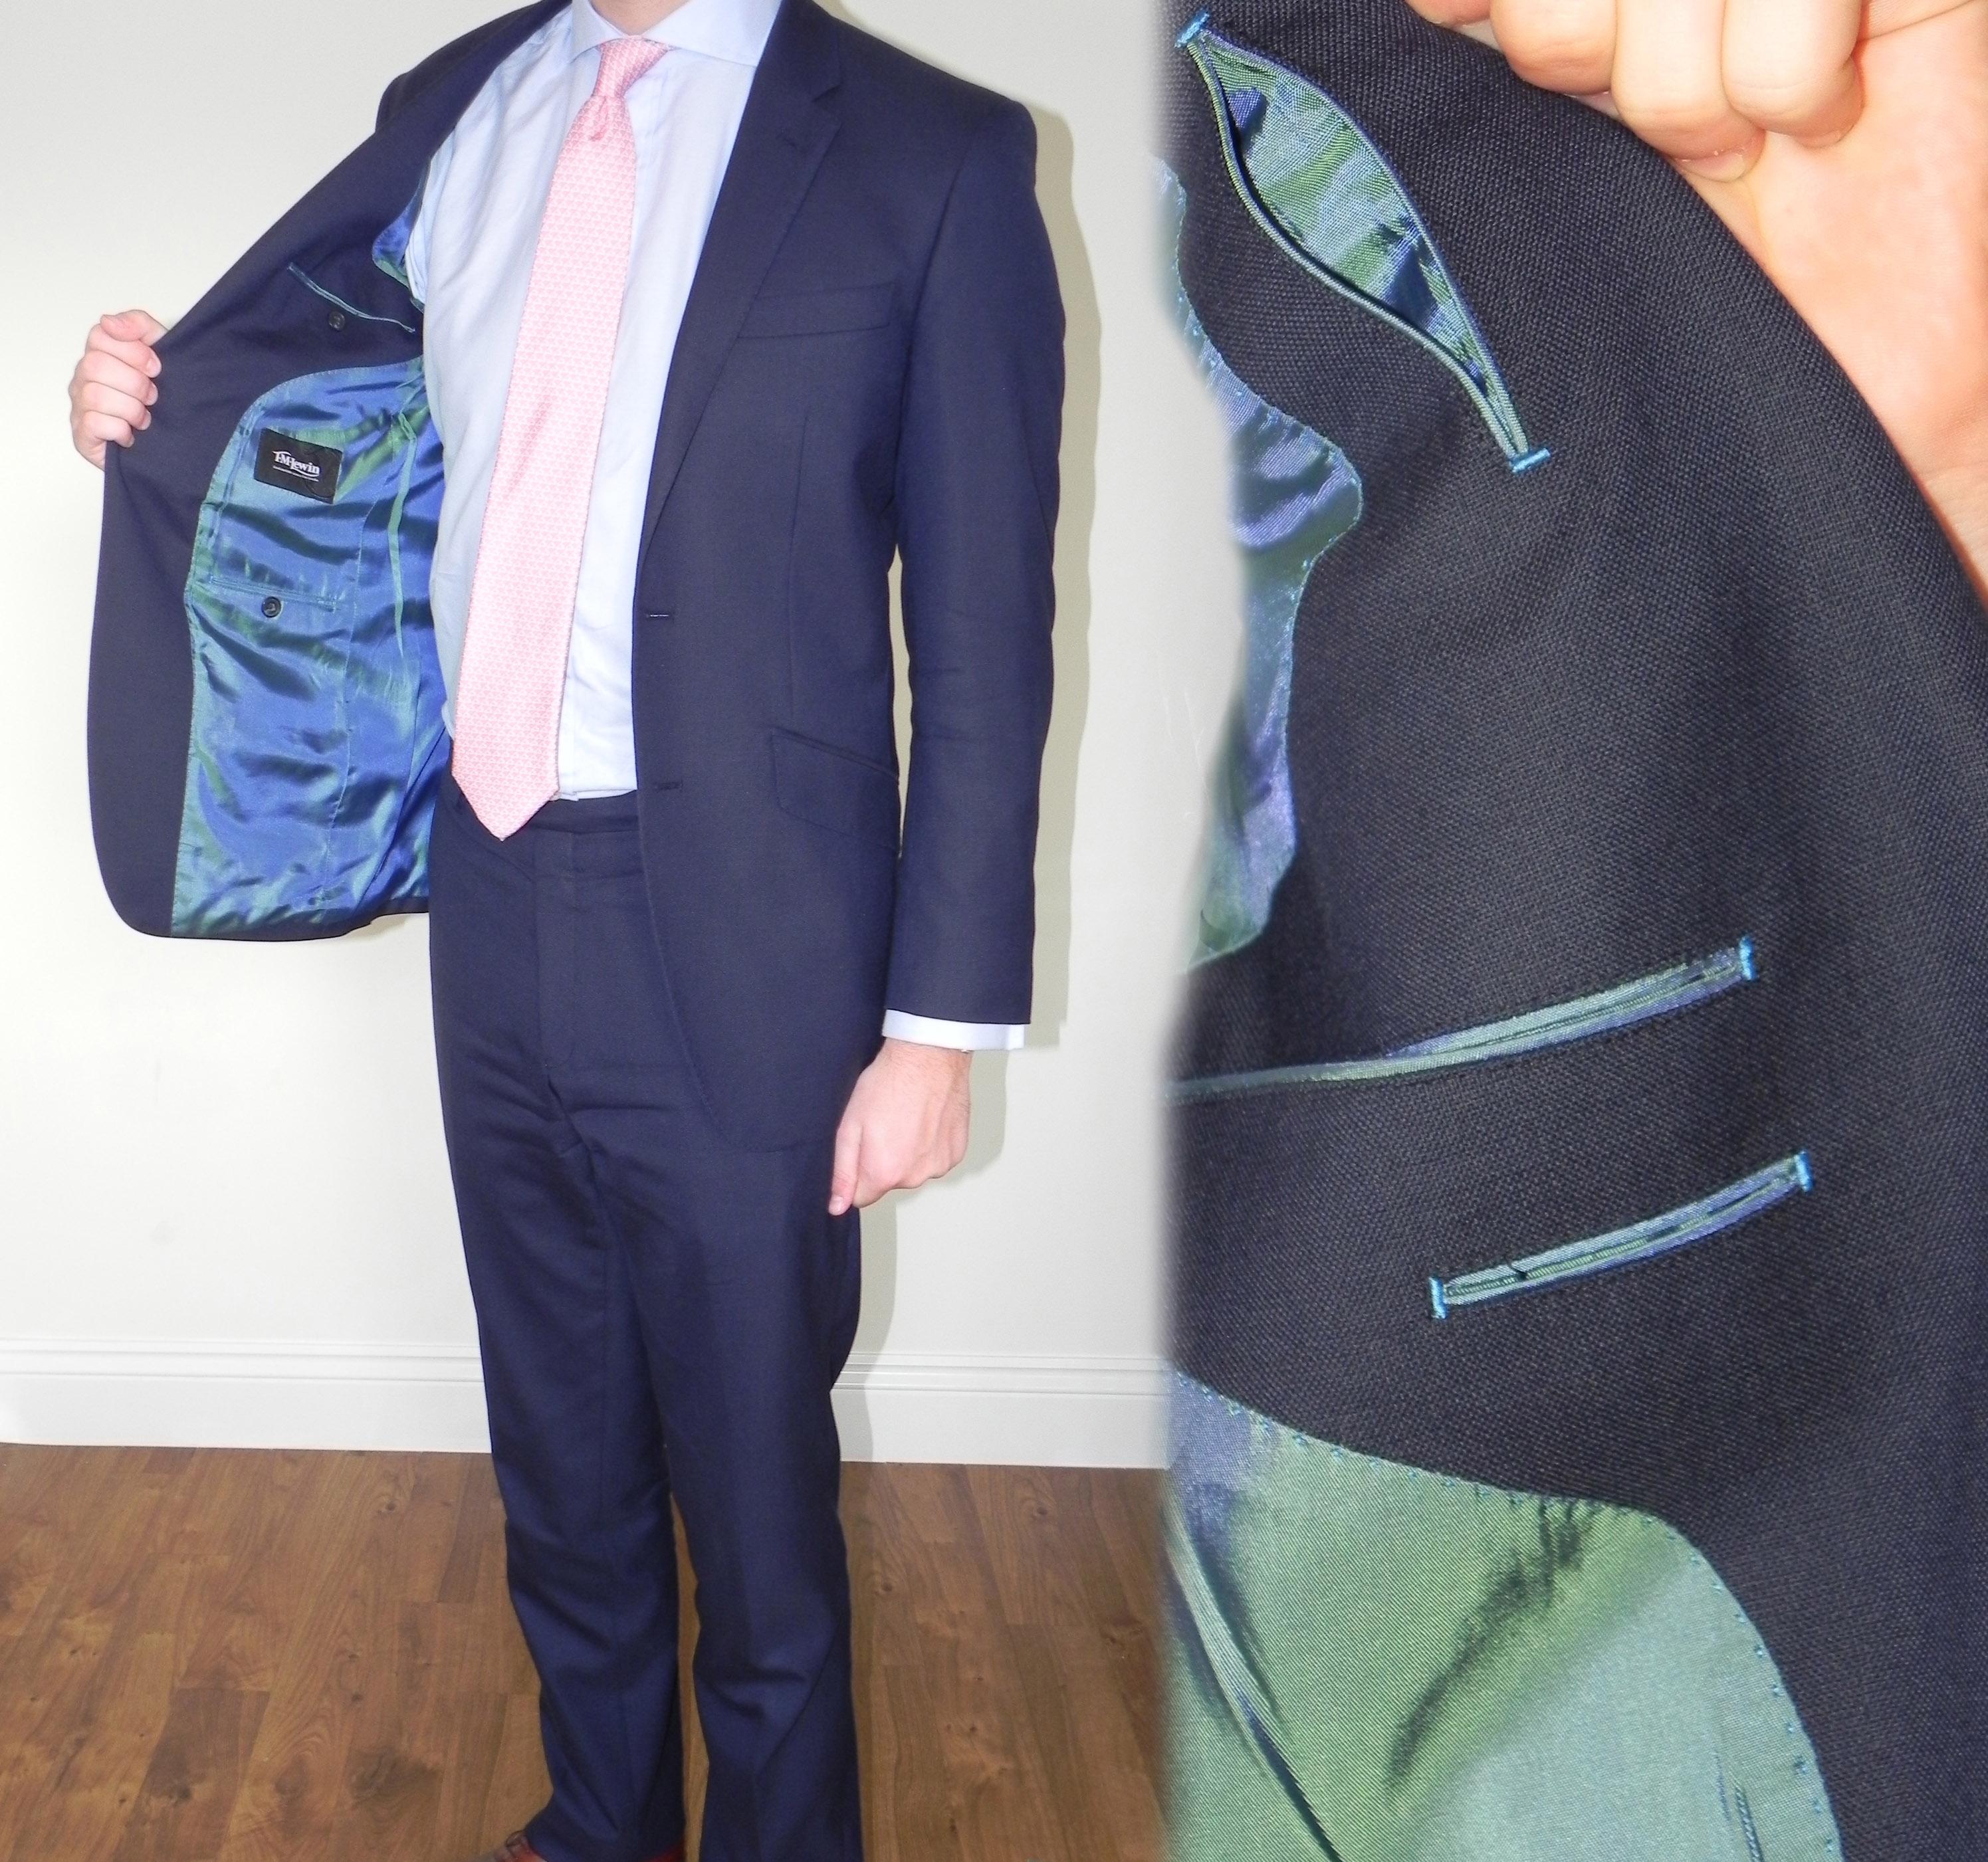 Tm Lewin Suit Review An Aspiring Gent